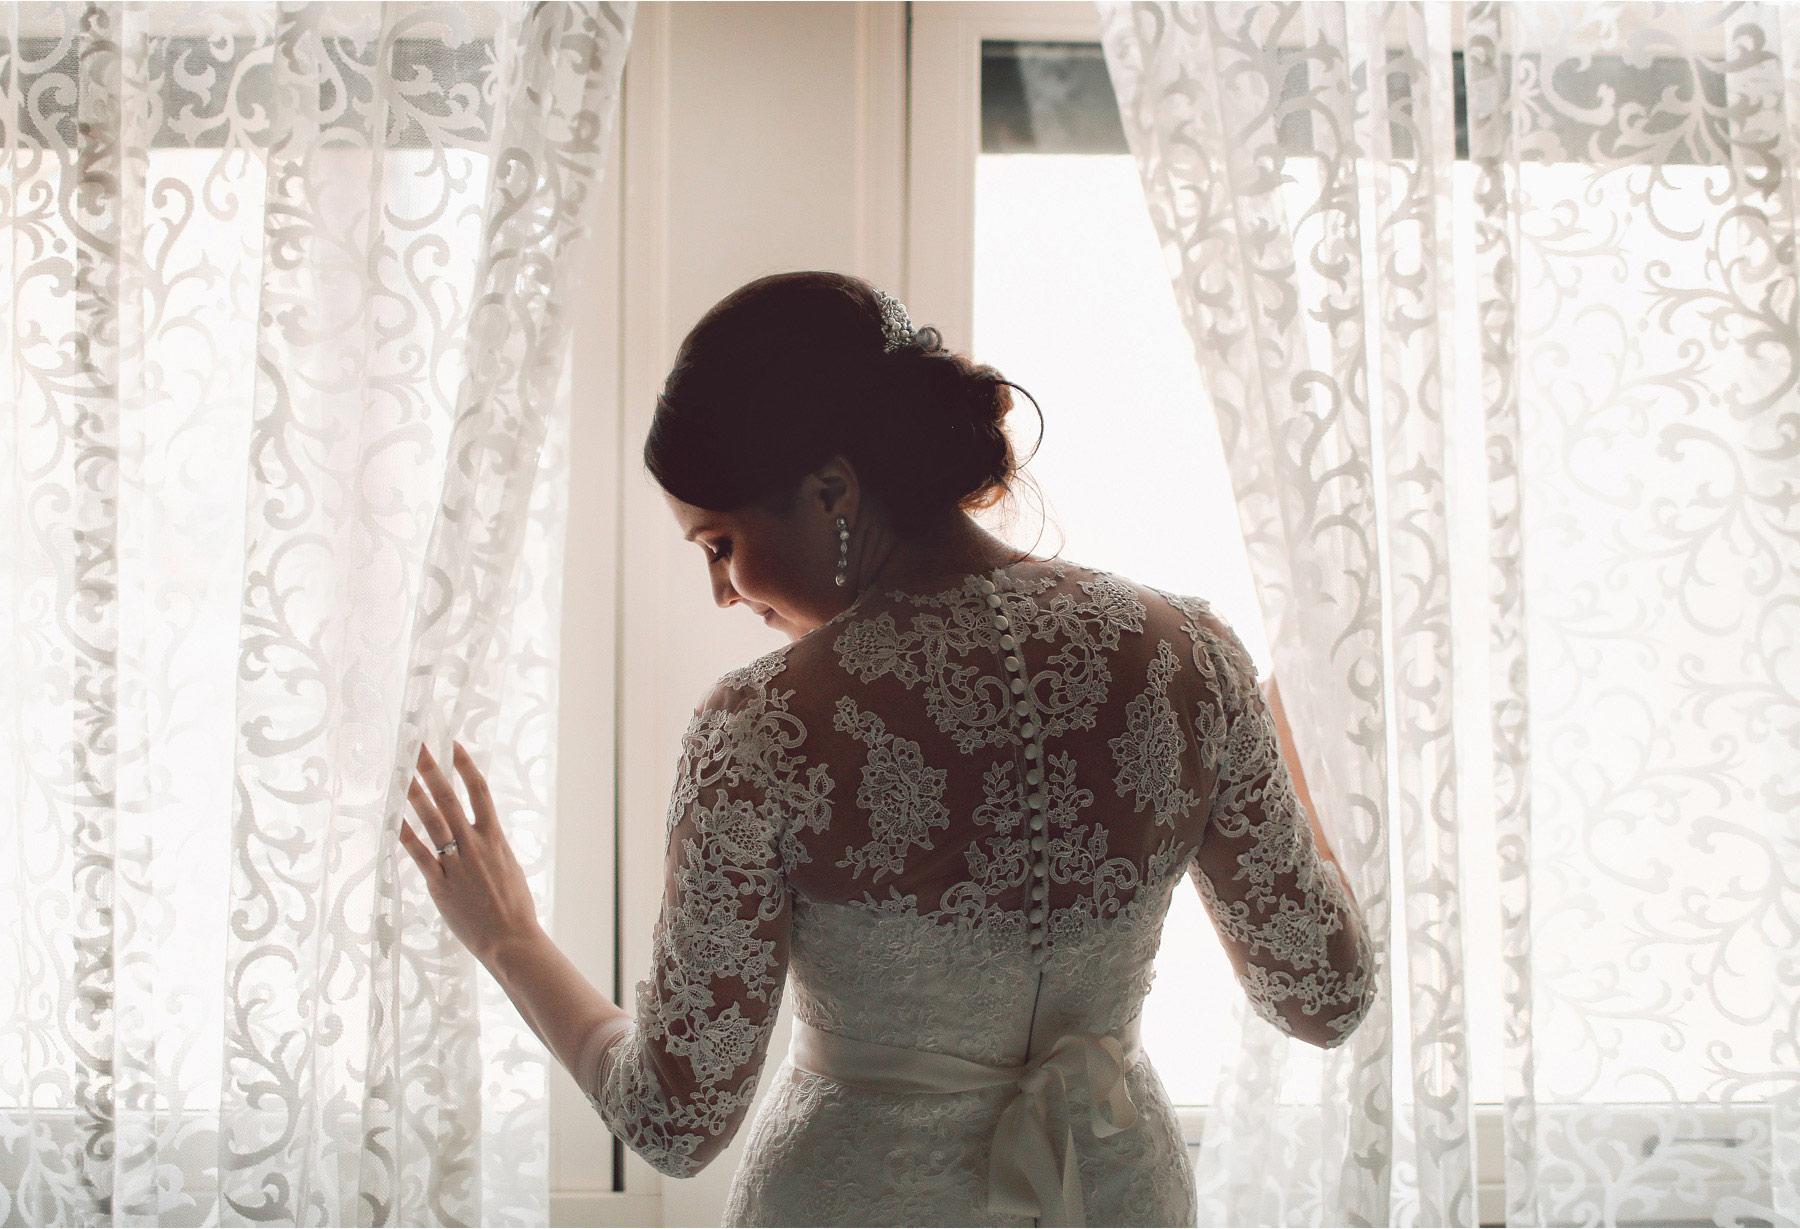 02-Minneapolis-Minnesota-Wedding-Photographer-by-Andrew-Vick-Photography-Winter-Renaissance-Hotel-Getting-Ready-Bride-Dress-Vintage-Sara-and-Rob.jpg